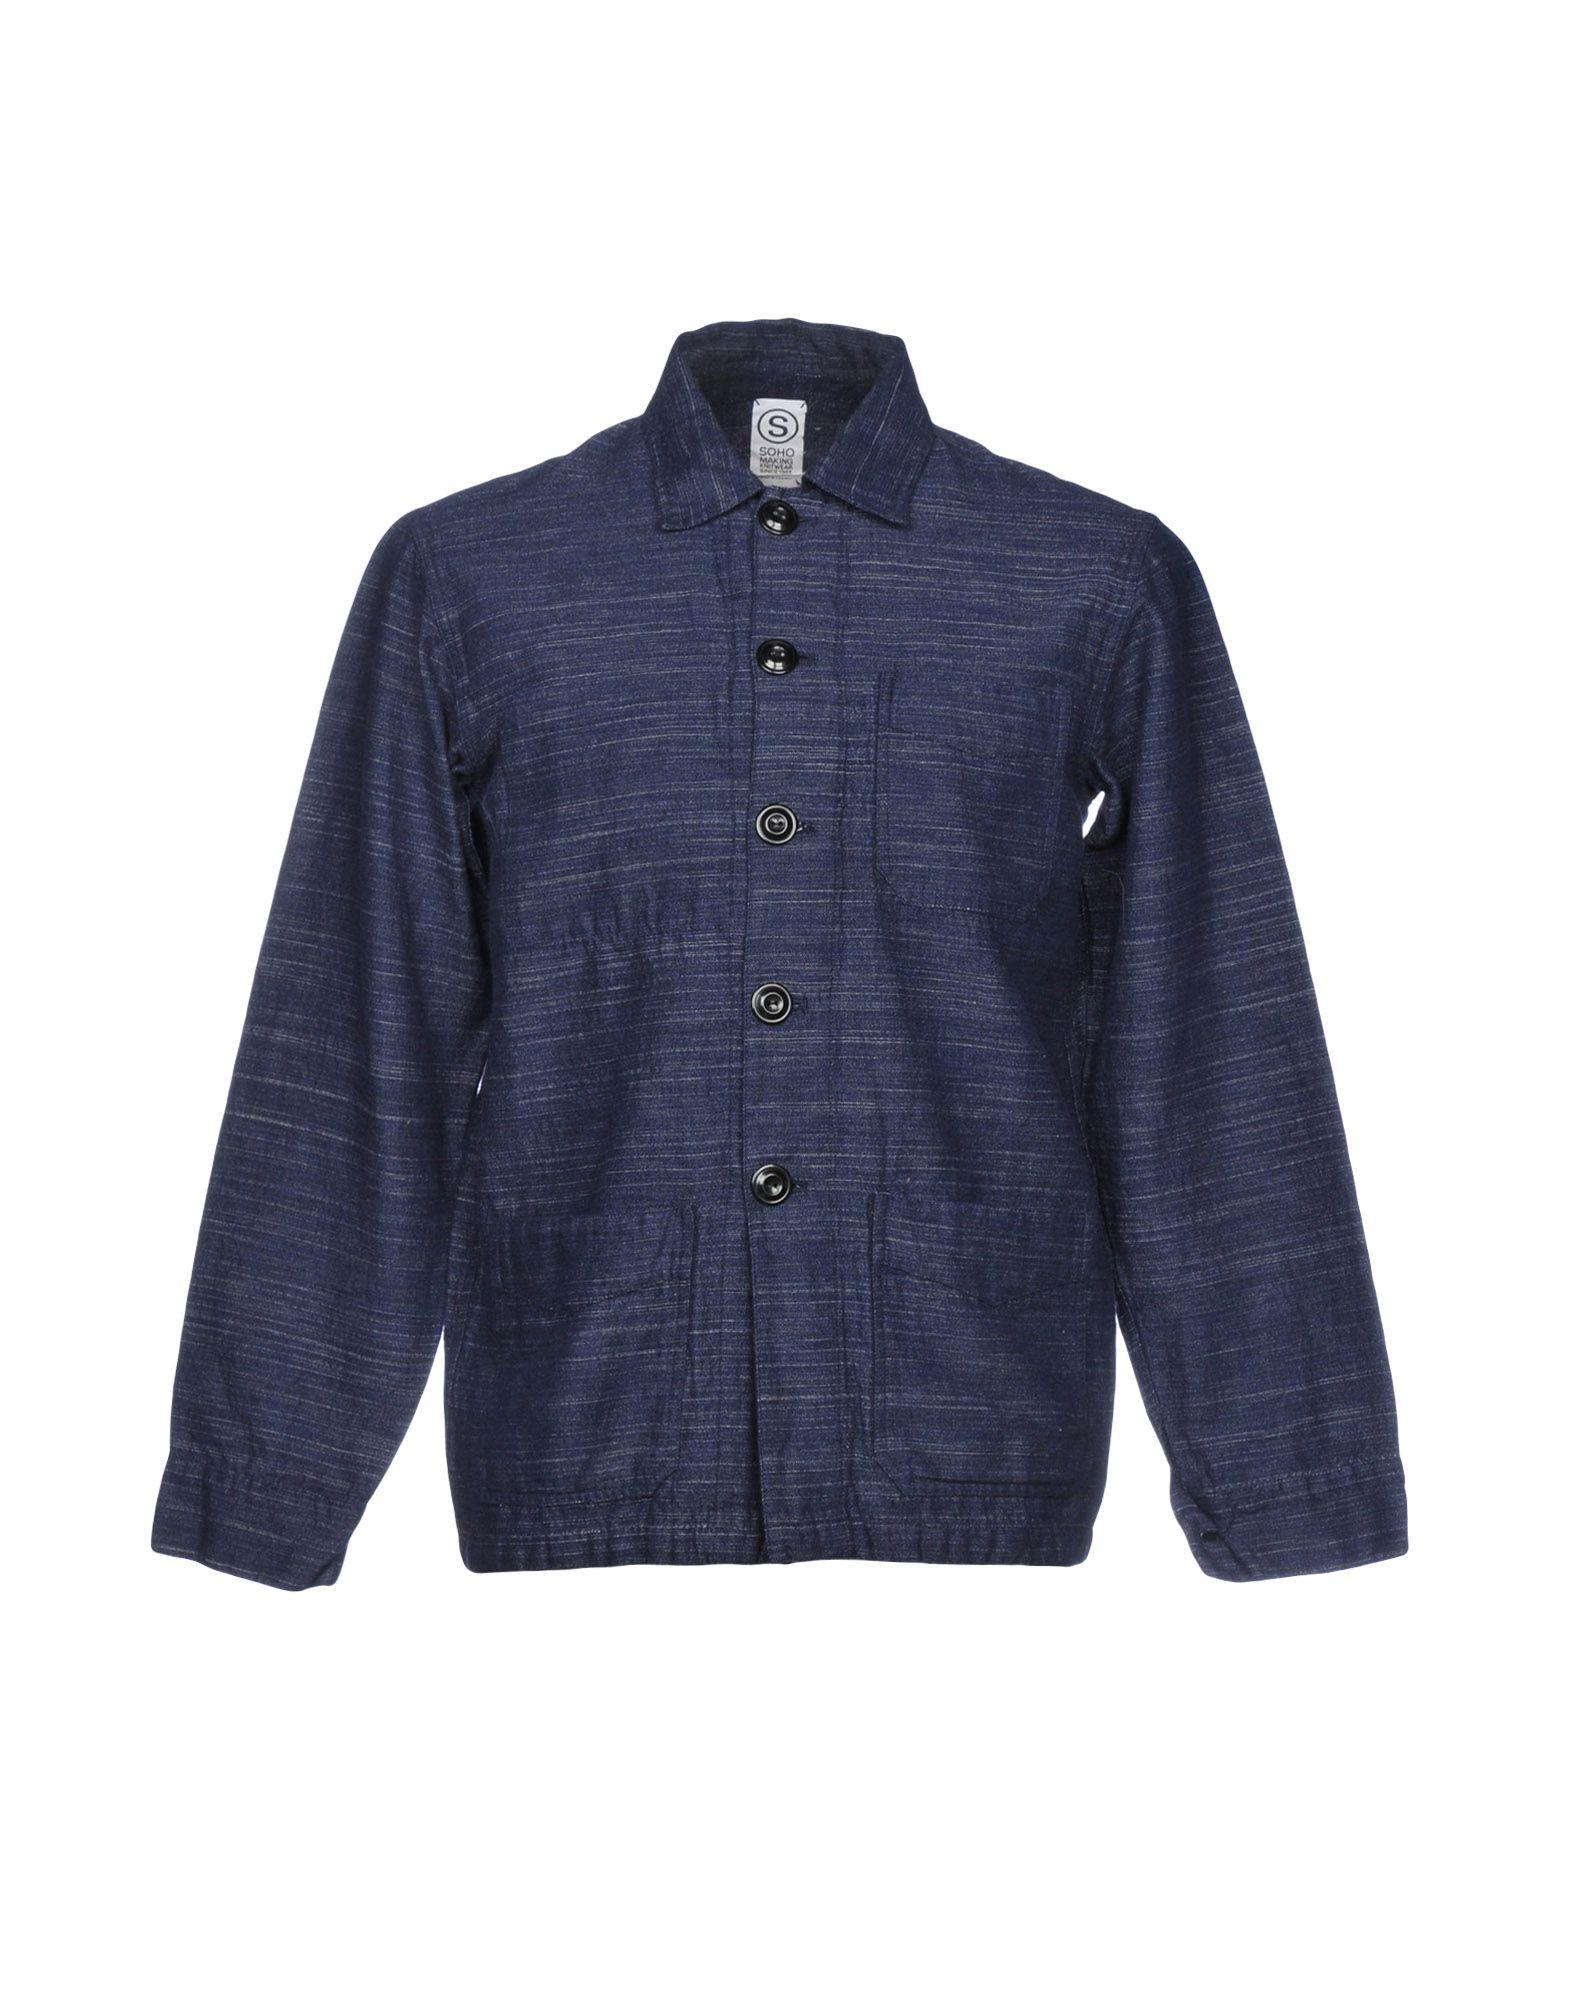 SOHO Jacket in Dark Blue